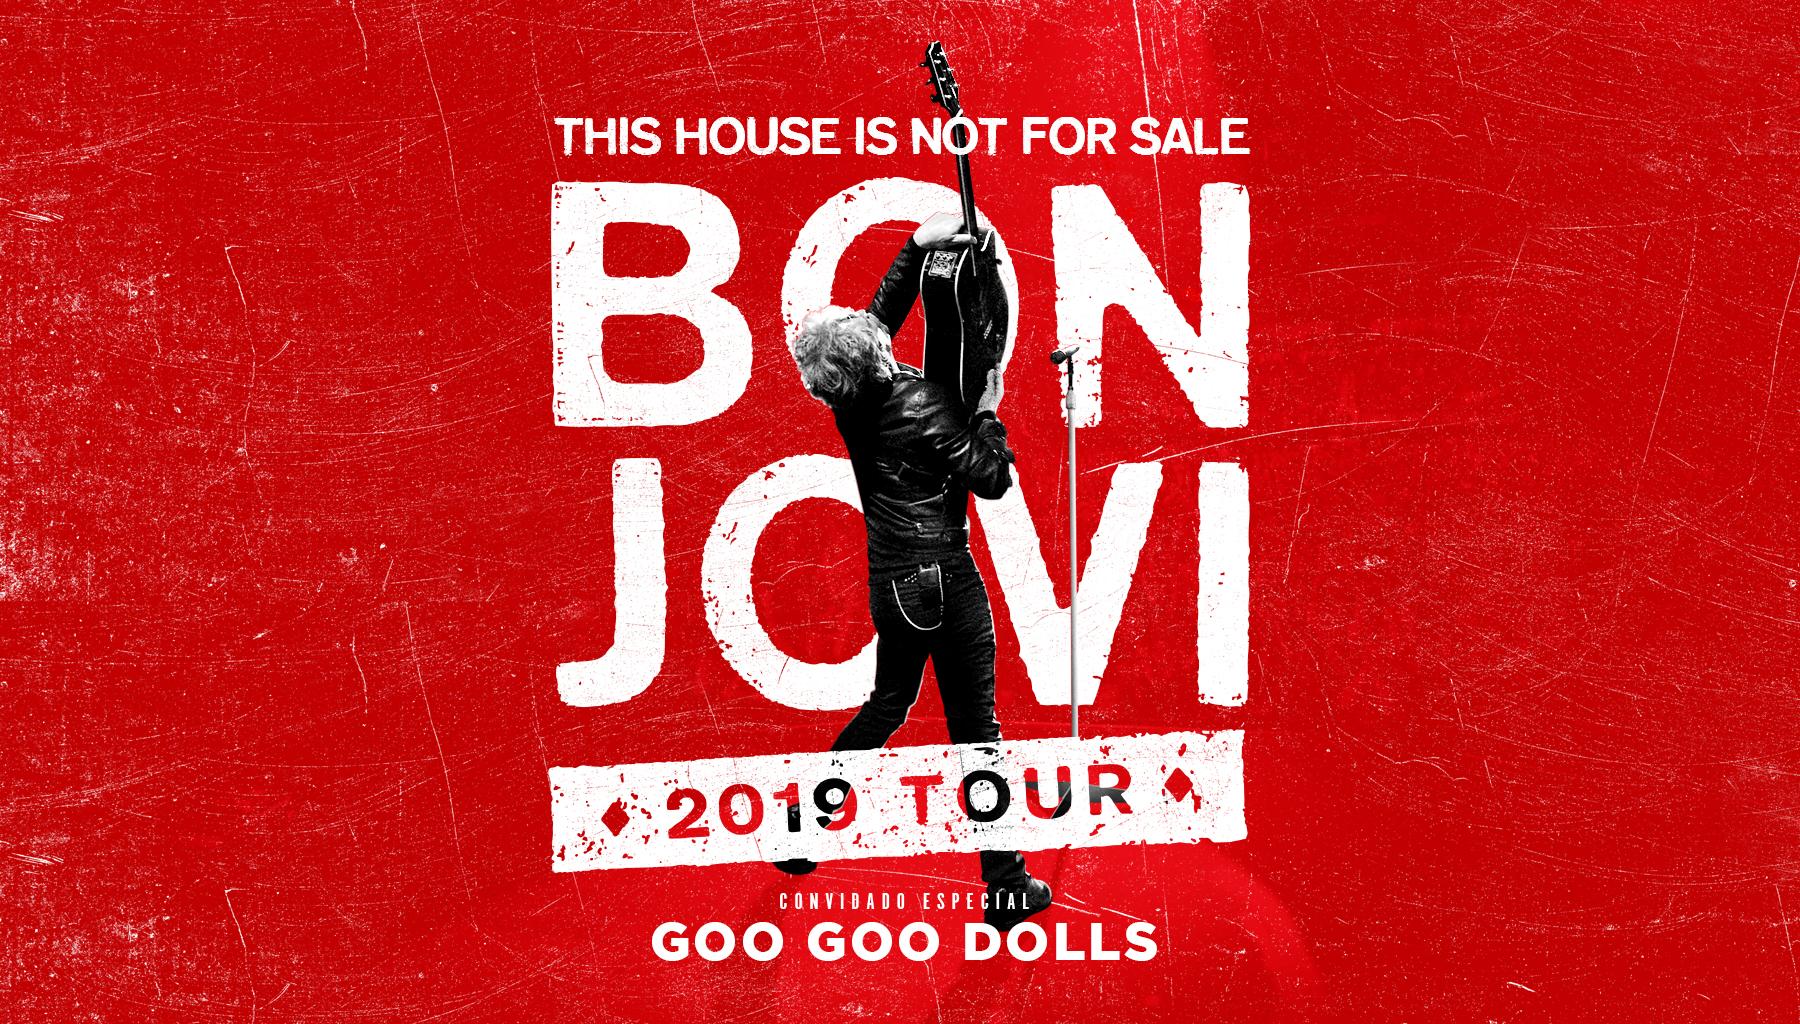 Bon Jovi confirma três shows no Brasil fora do Rock in Rio; veja preços